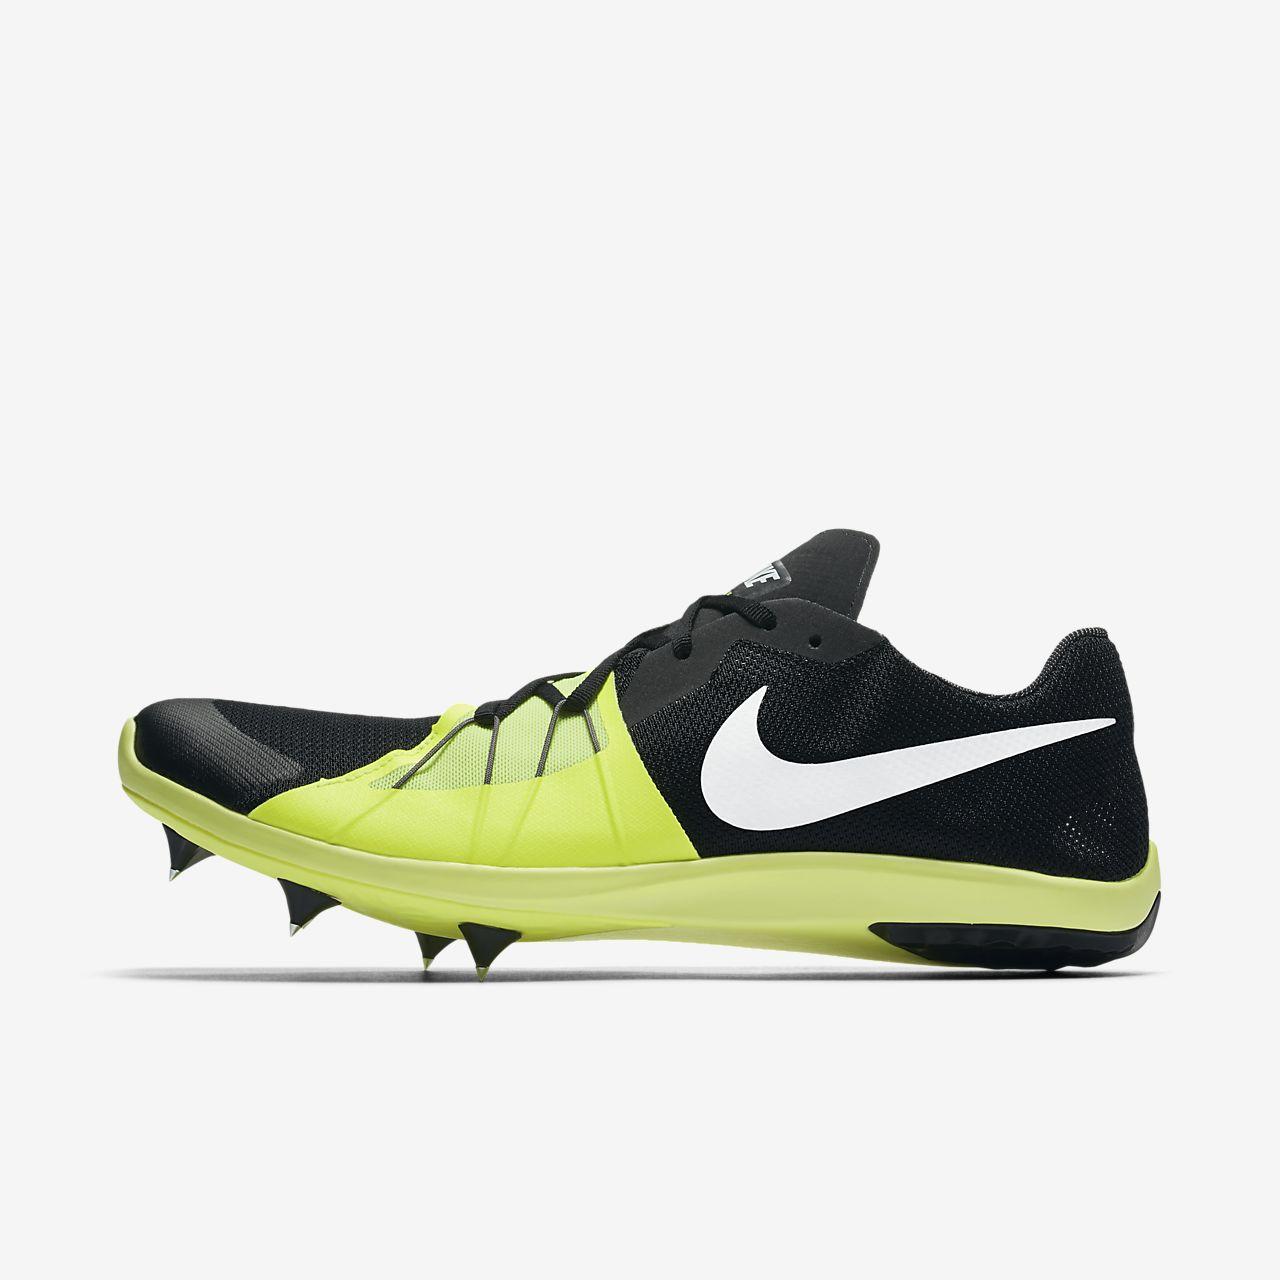 ... Calzado de atletismo con clavos unisex Nike Zoom Forever XC 5